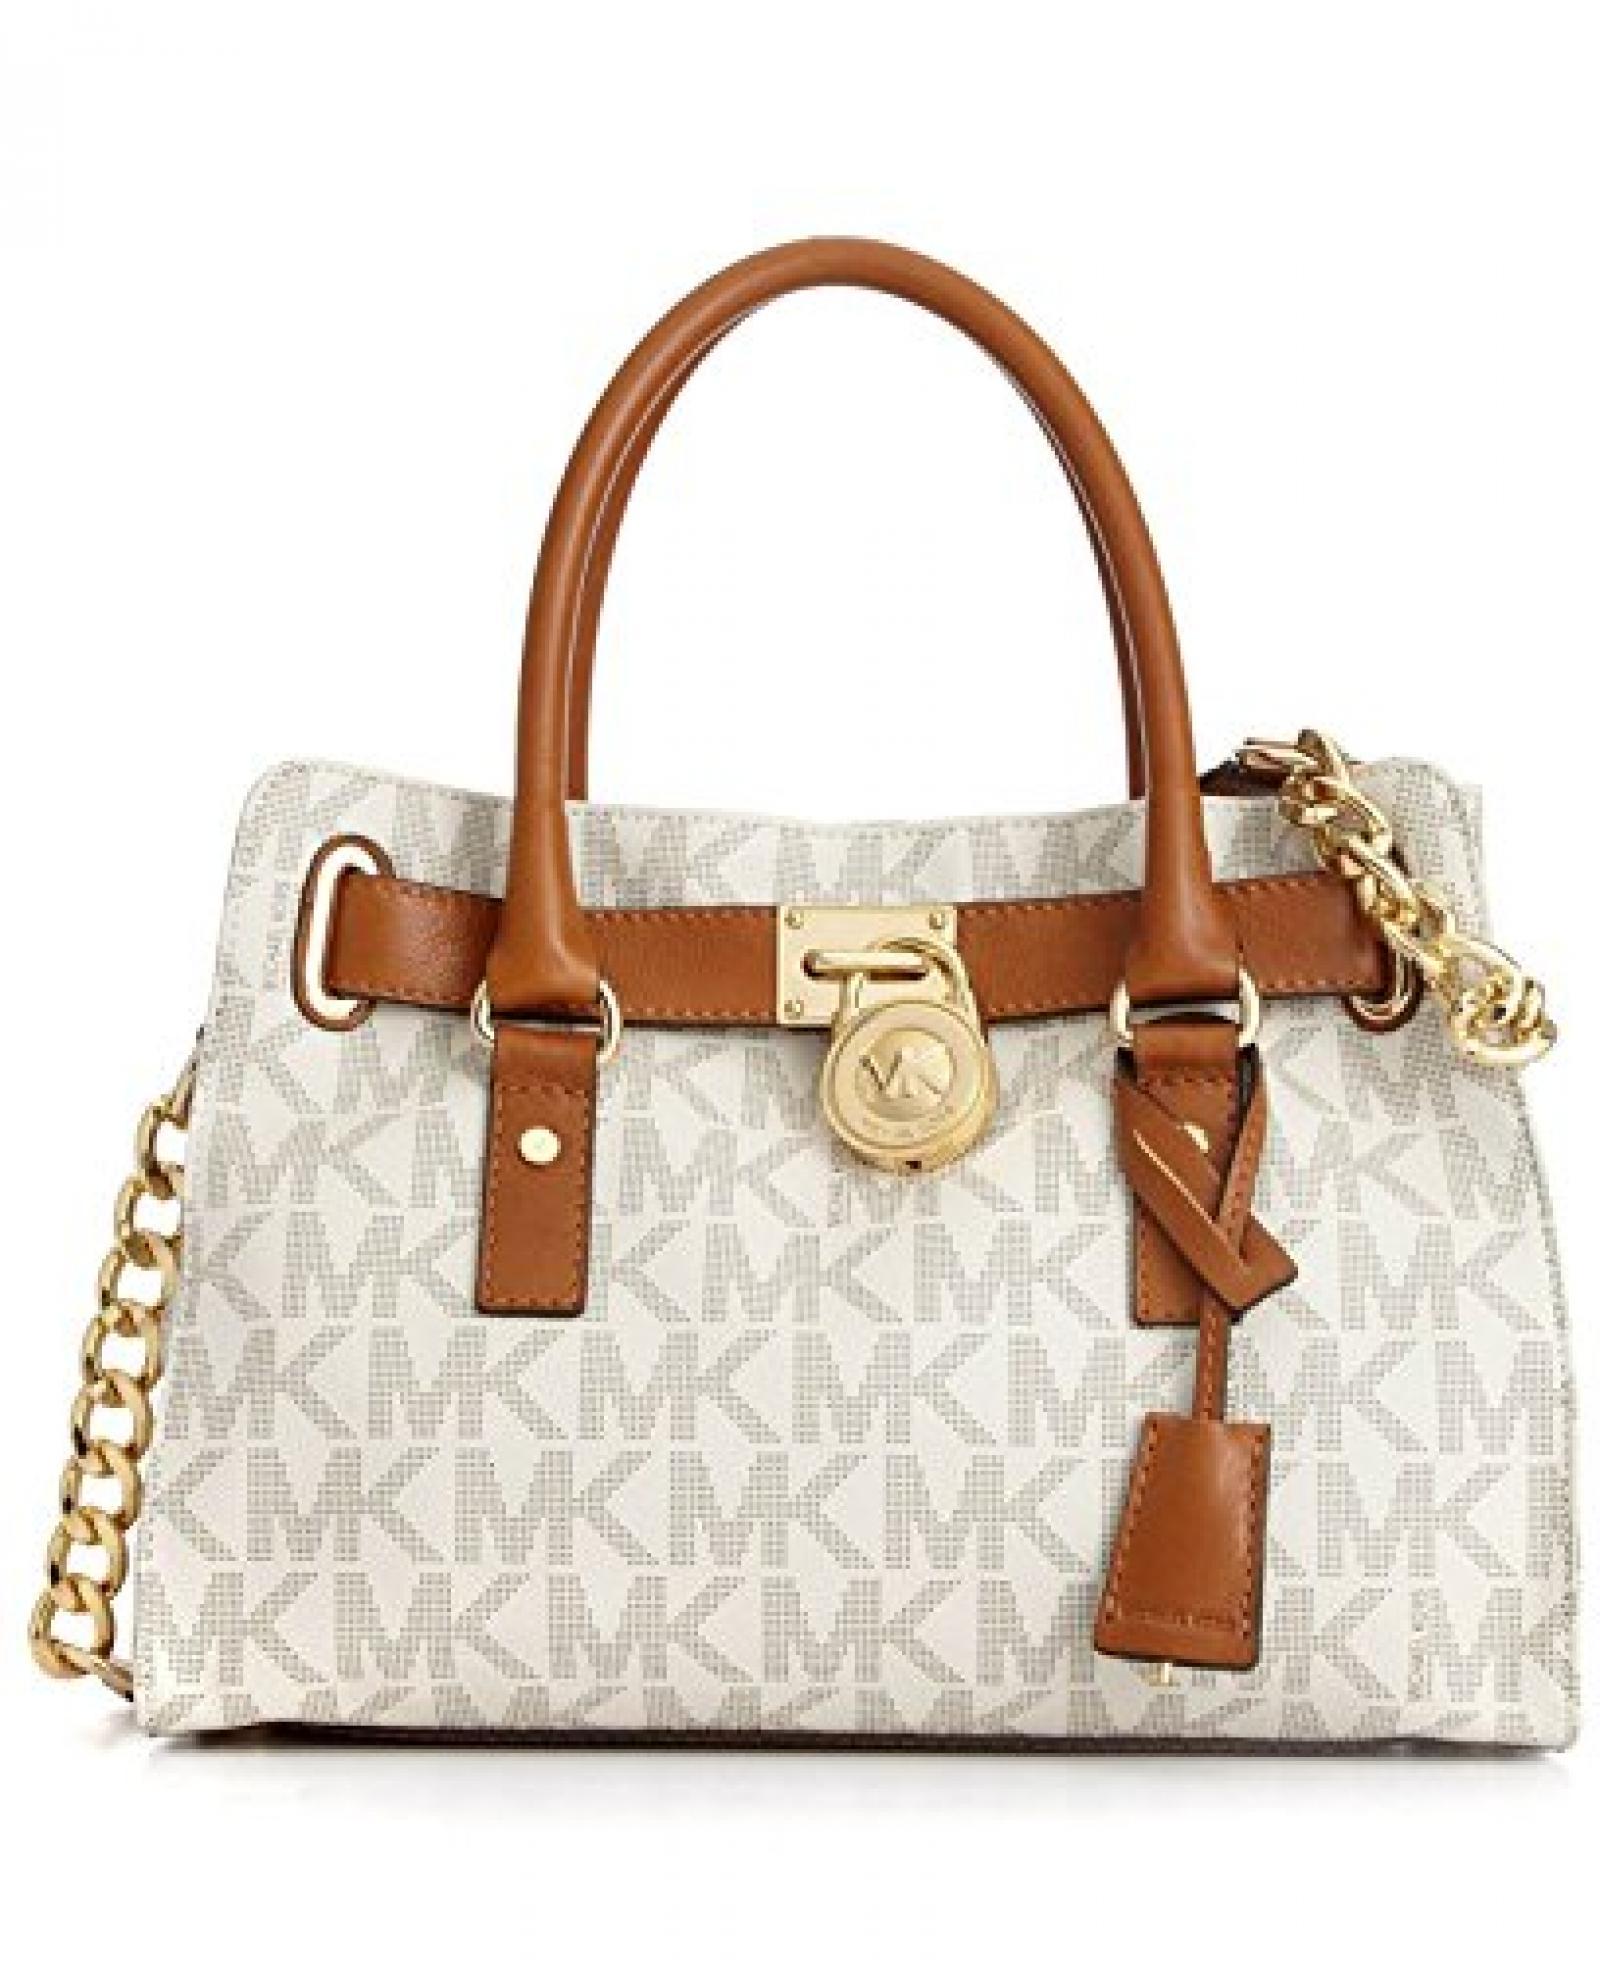 Michael Kors EW Satchel Womens MK Logo Handbag Tote Purse White